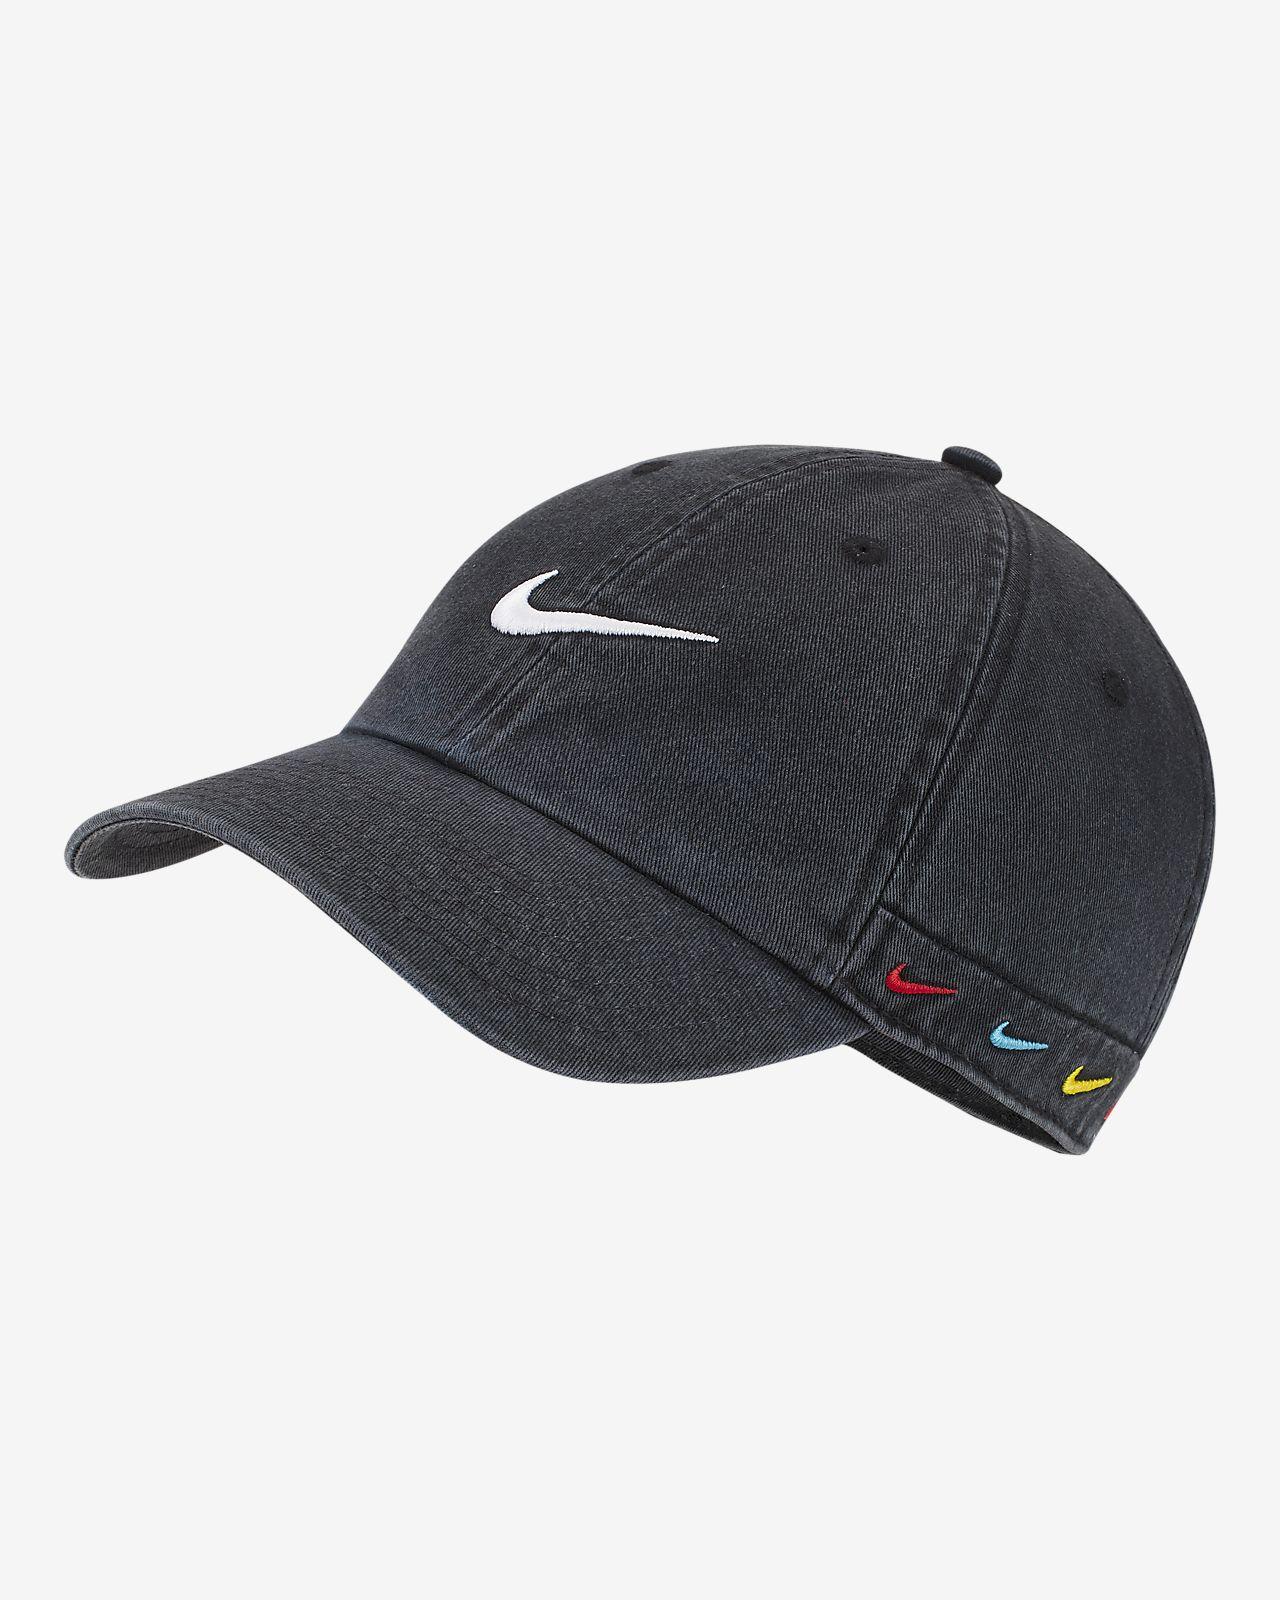 5ecf1a6ca8a65 Nike Heritage86 Kyrie